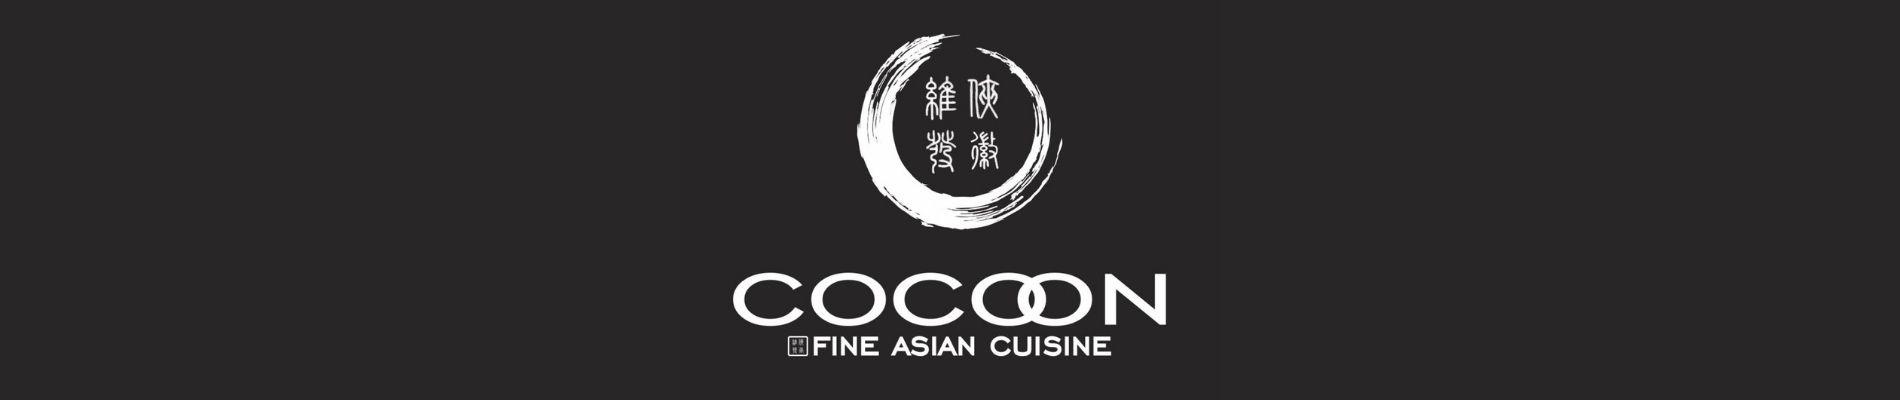 Resataurant Neumarkt Cocoon Teaser